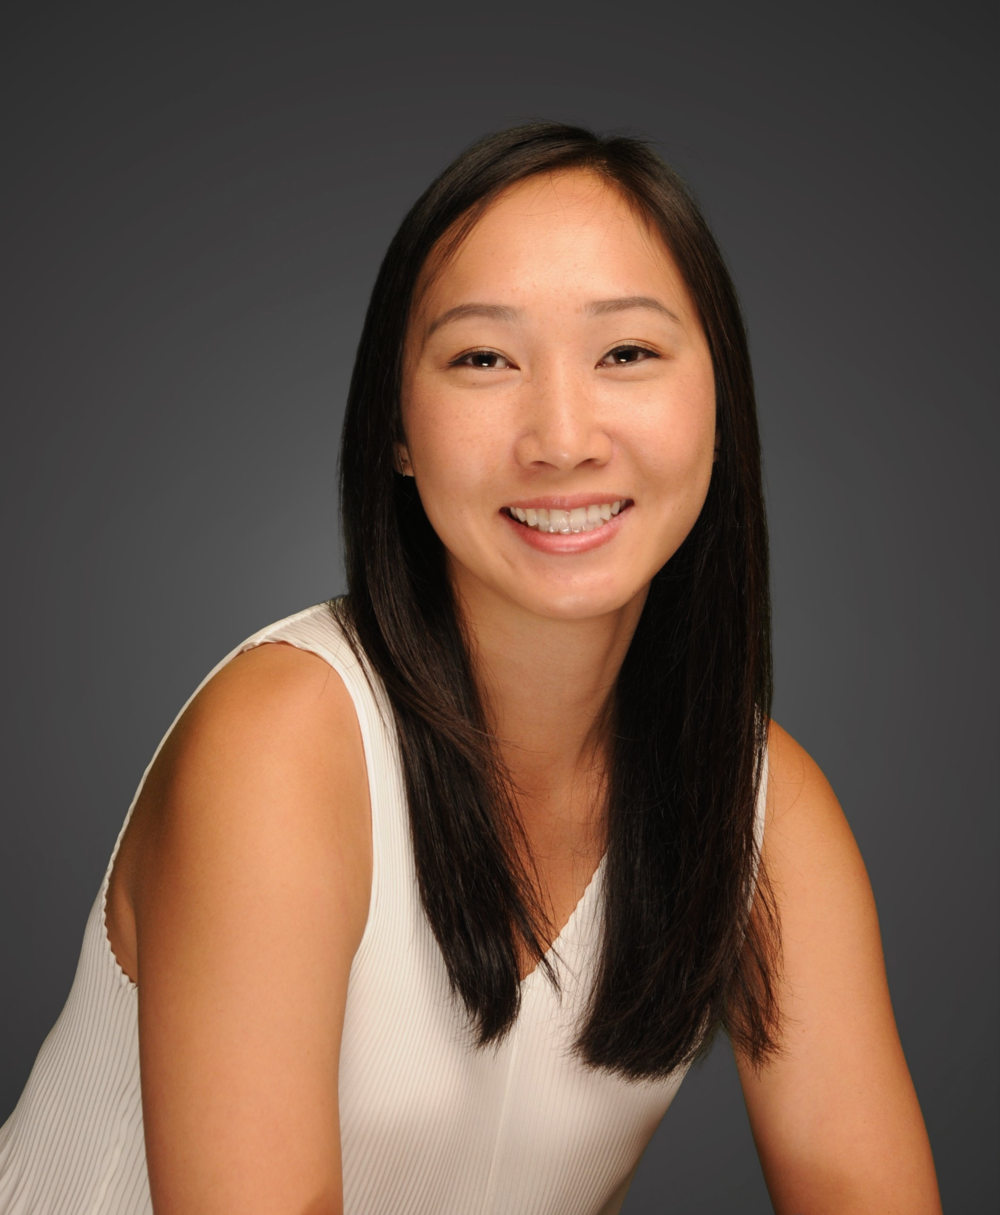 Christi Yung,  Class of 2019